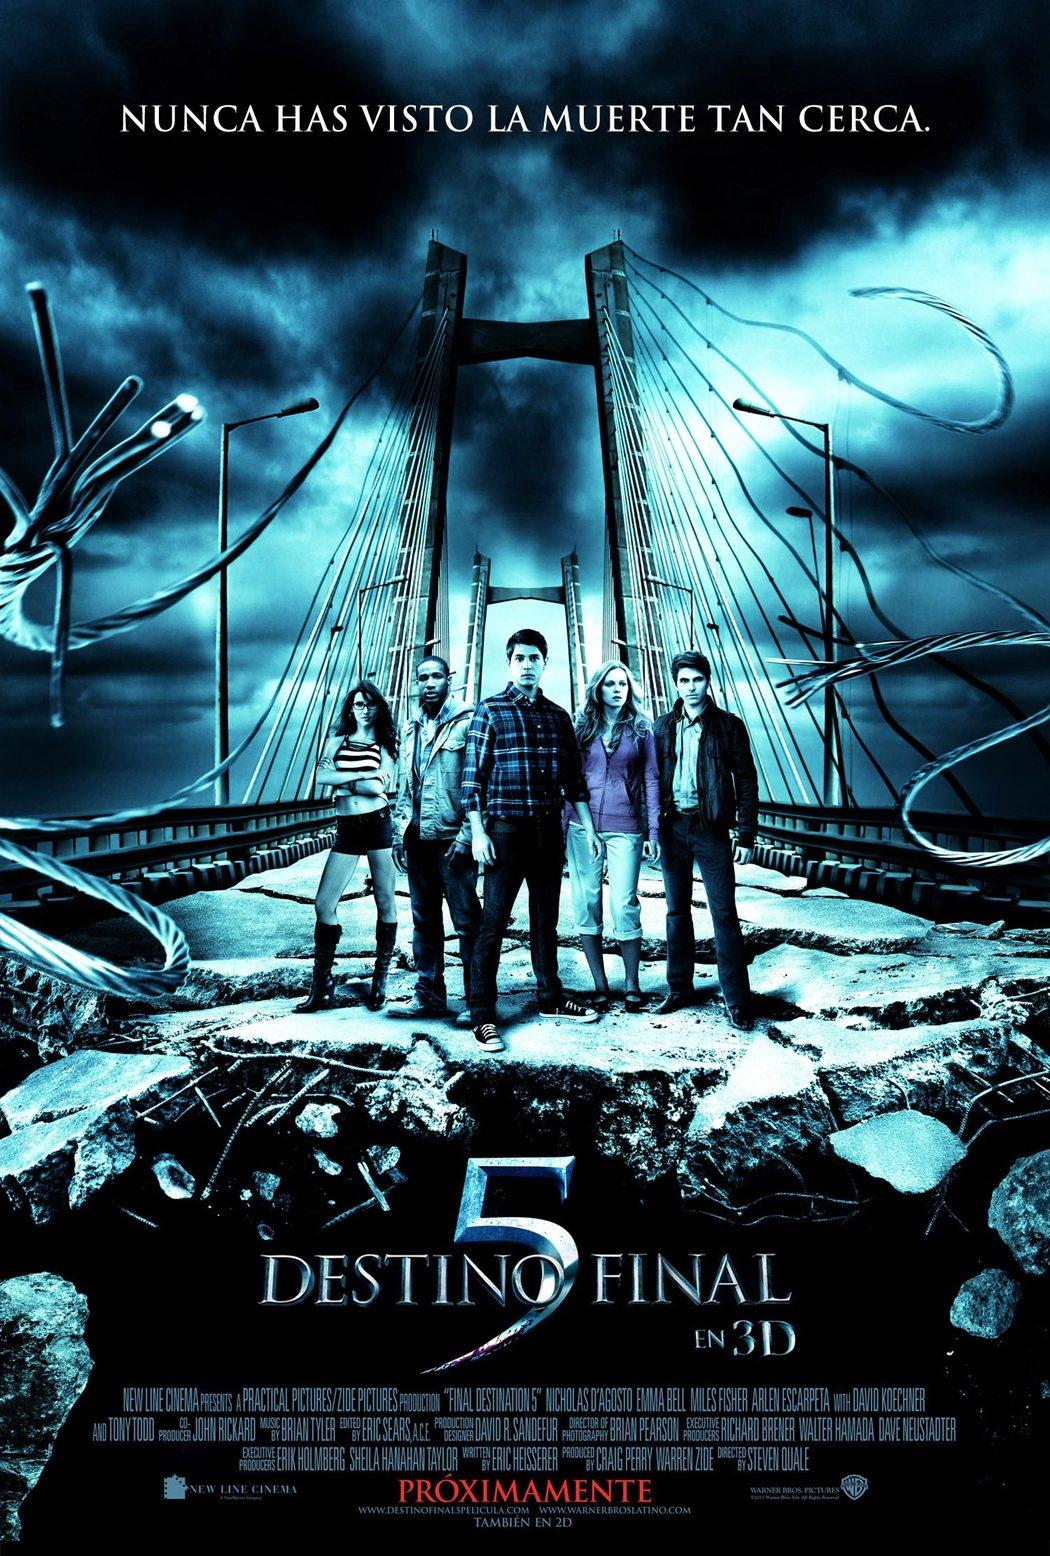 'Destino final 5'